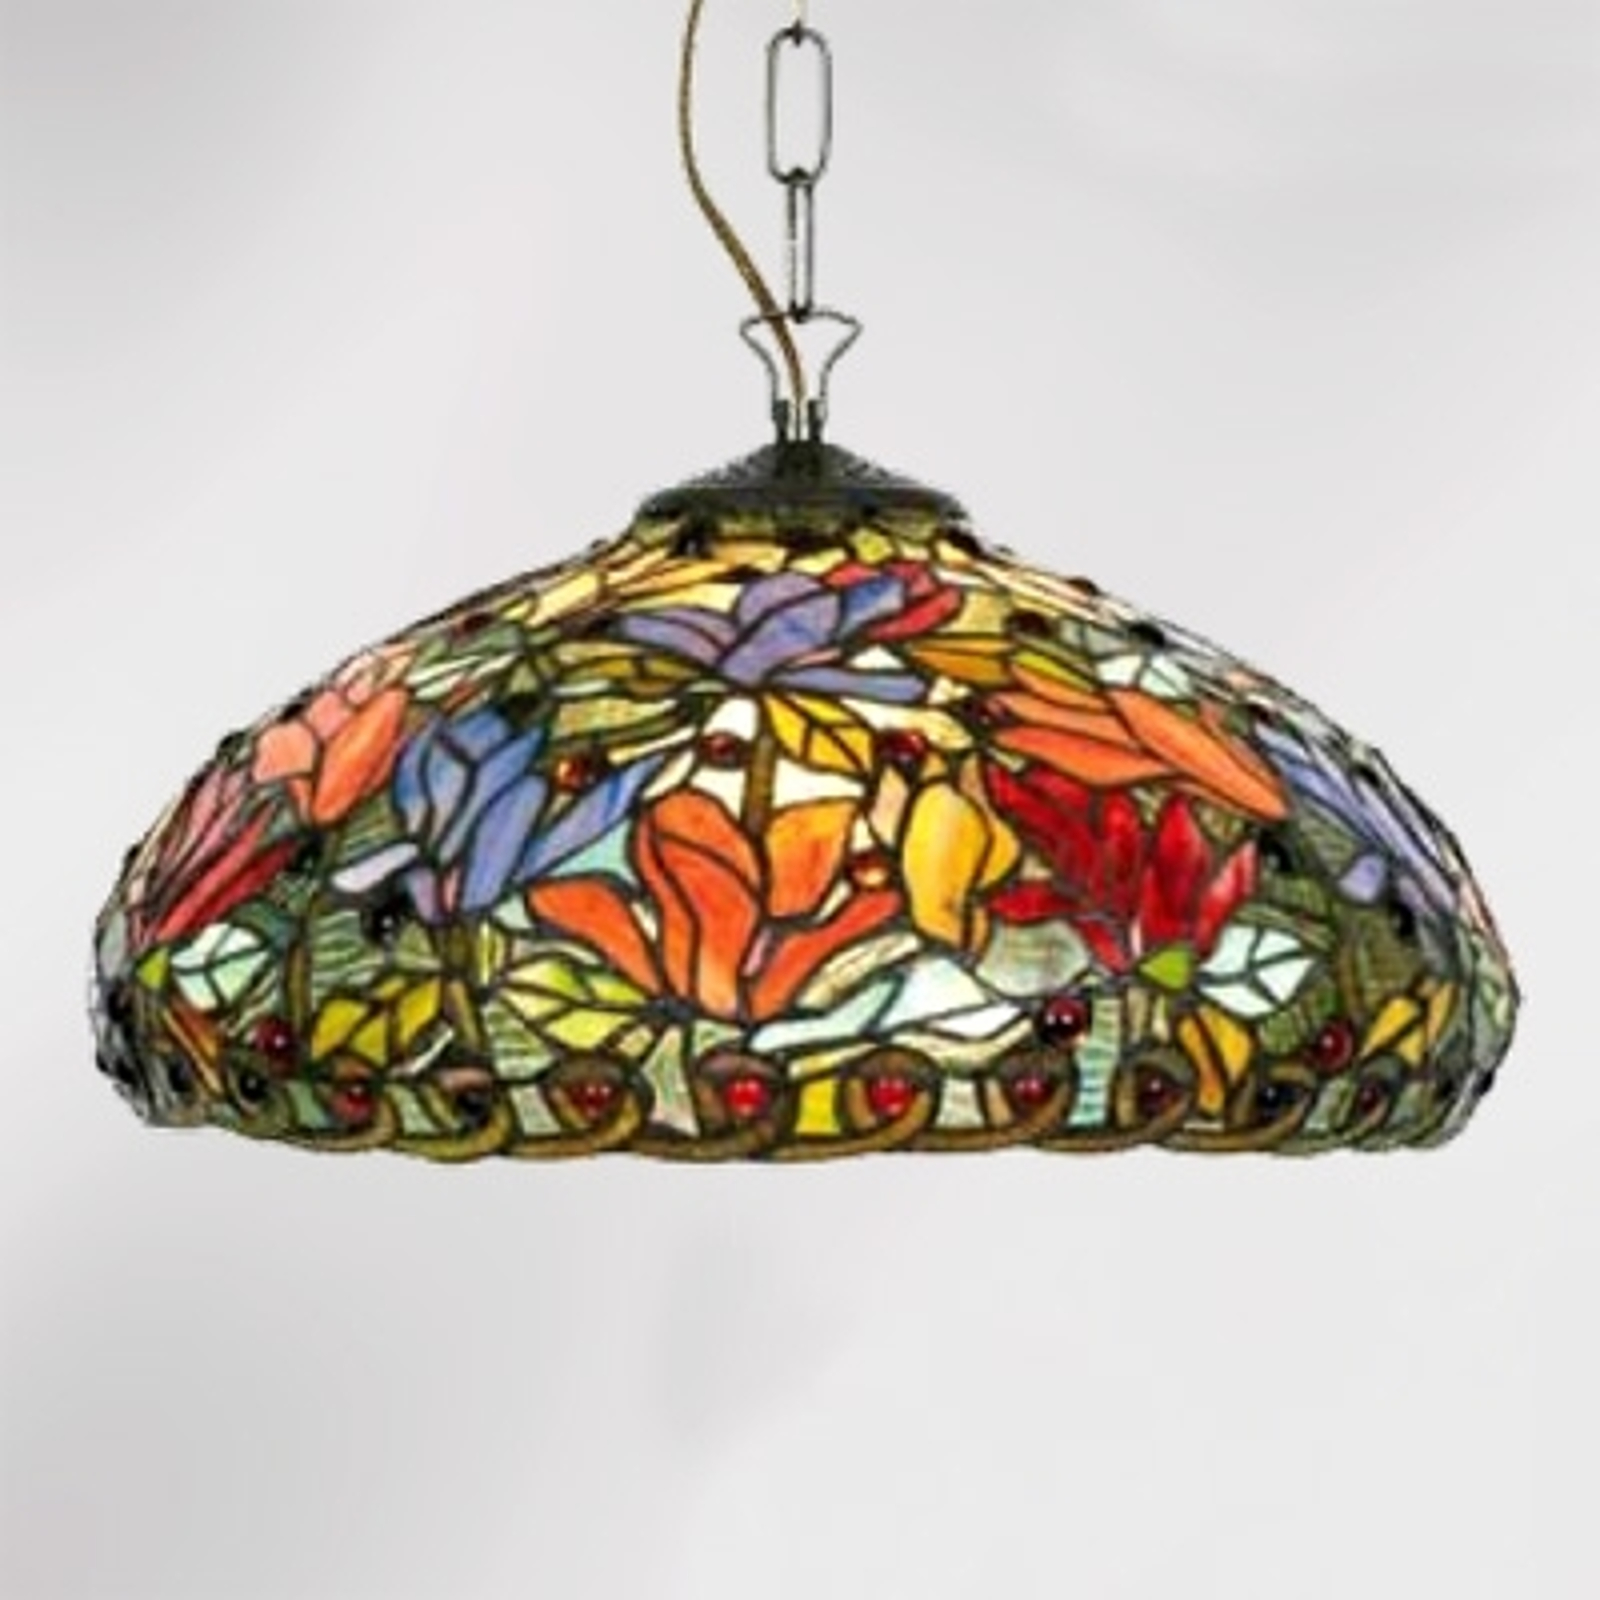 Suspension Elaine style Tiffany à 2 lampes